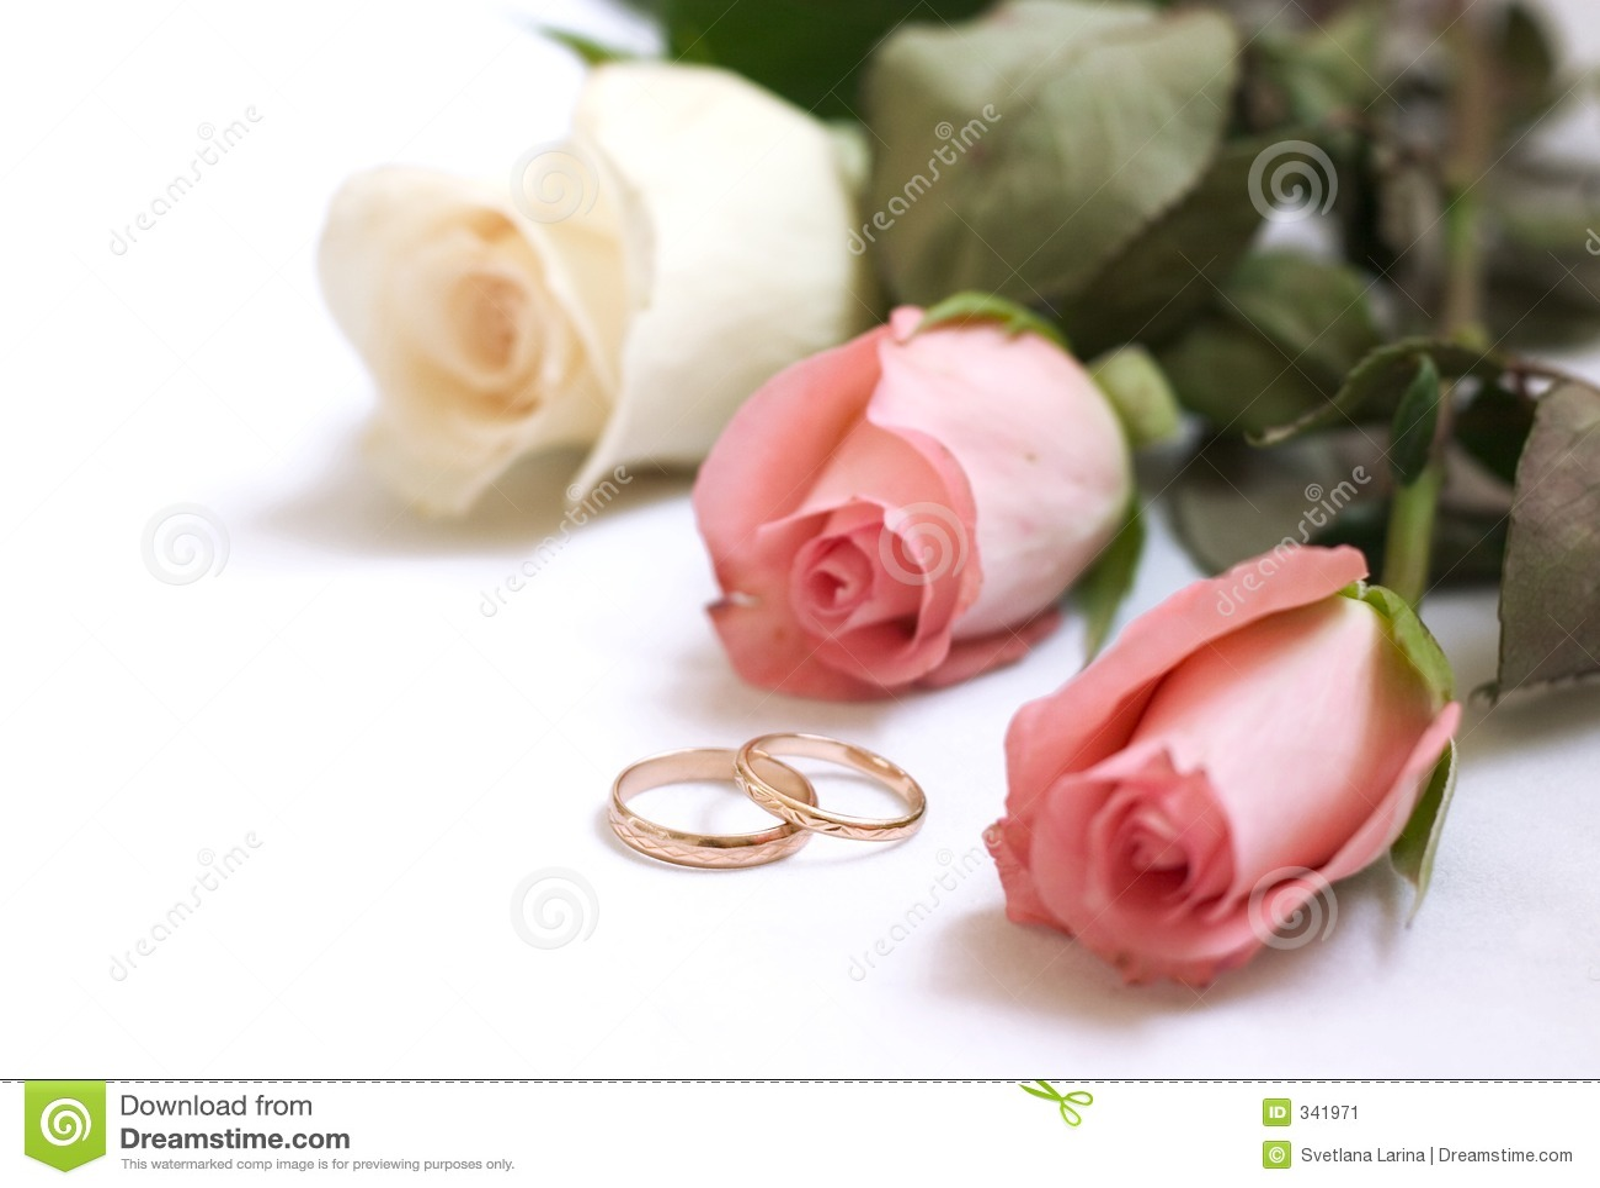 carte dinvitation mariage invitation mariage carte tattoo design bild. Black Bedroom Furniture Sets. Home Design Ideas